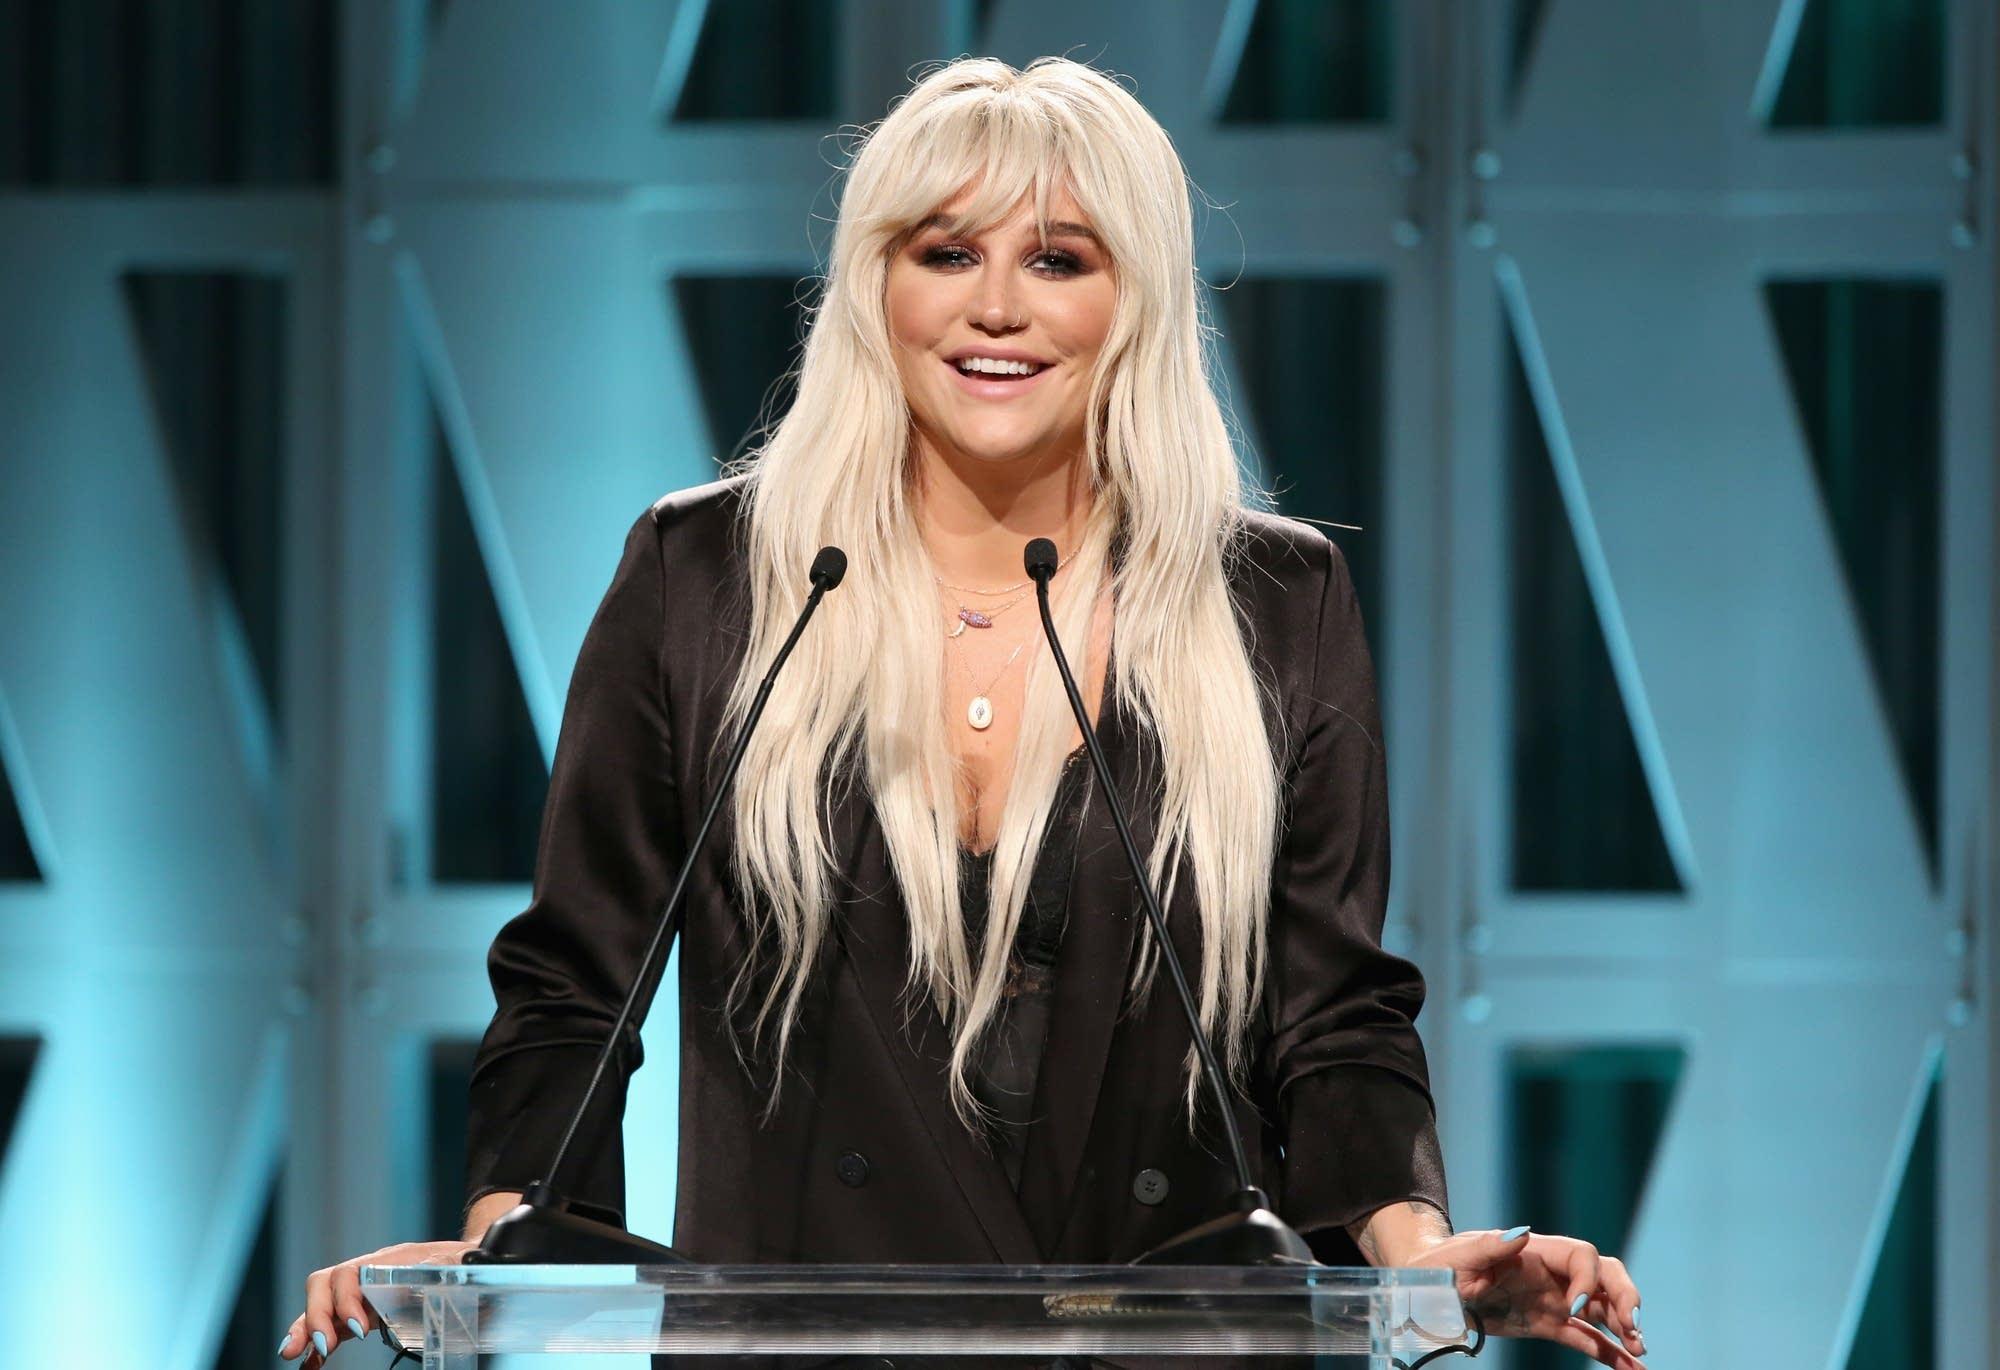 Kesha speaks onstage